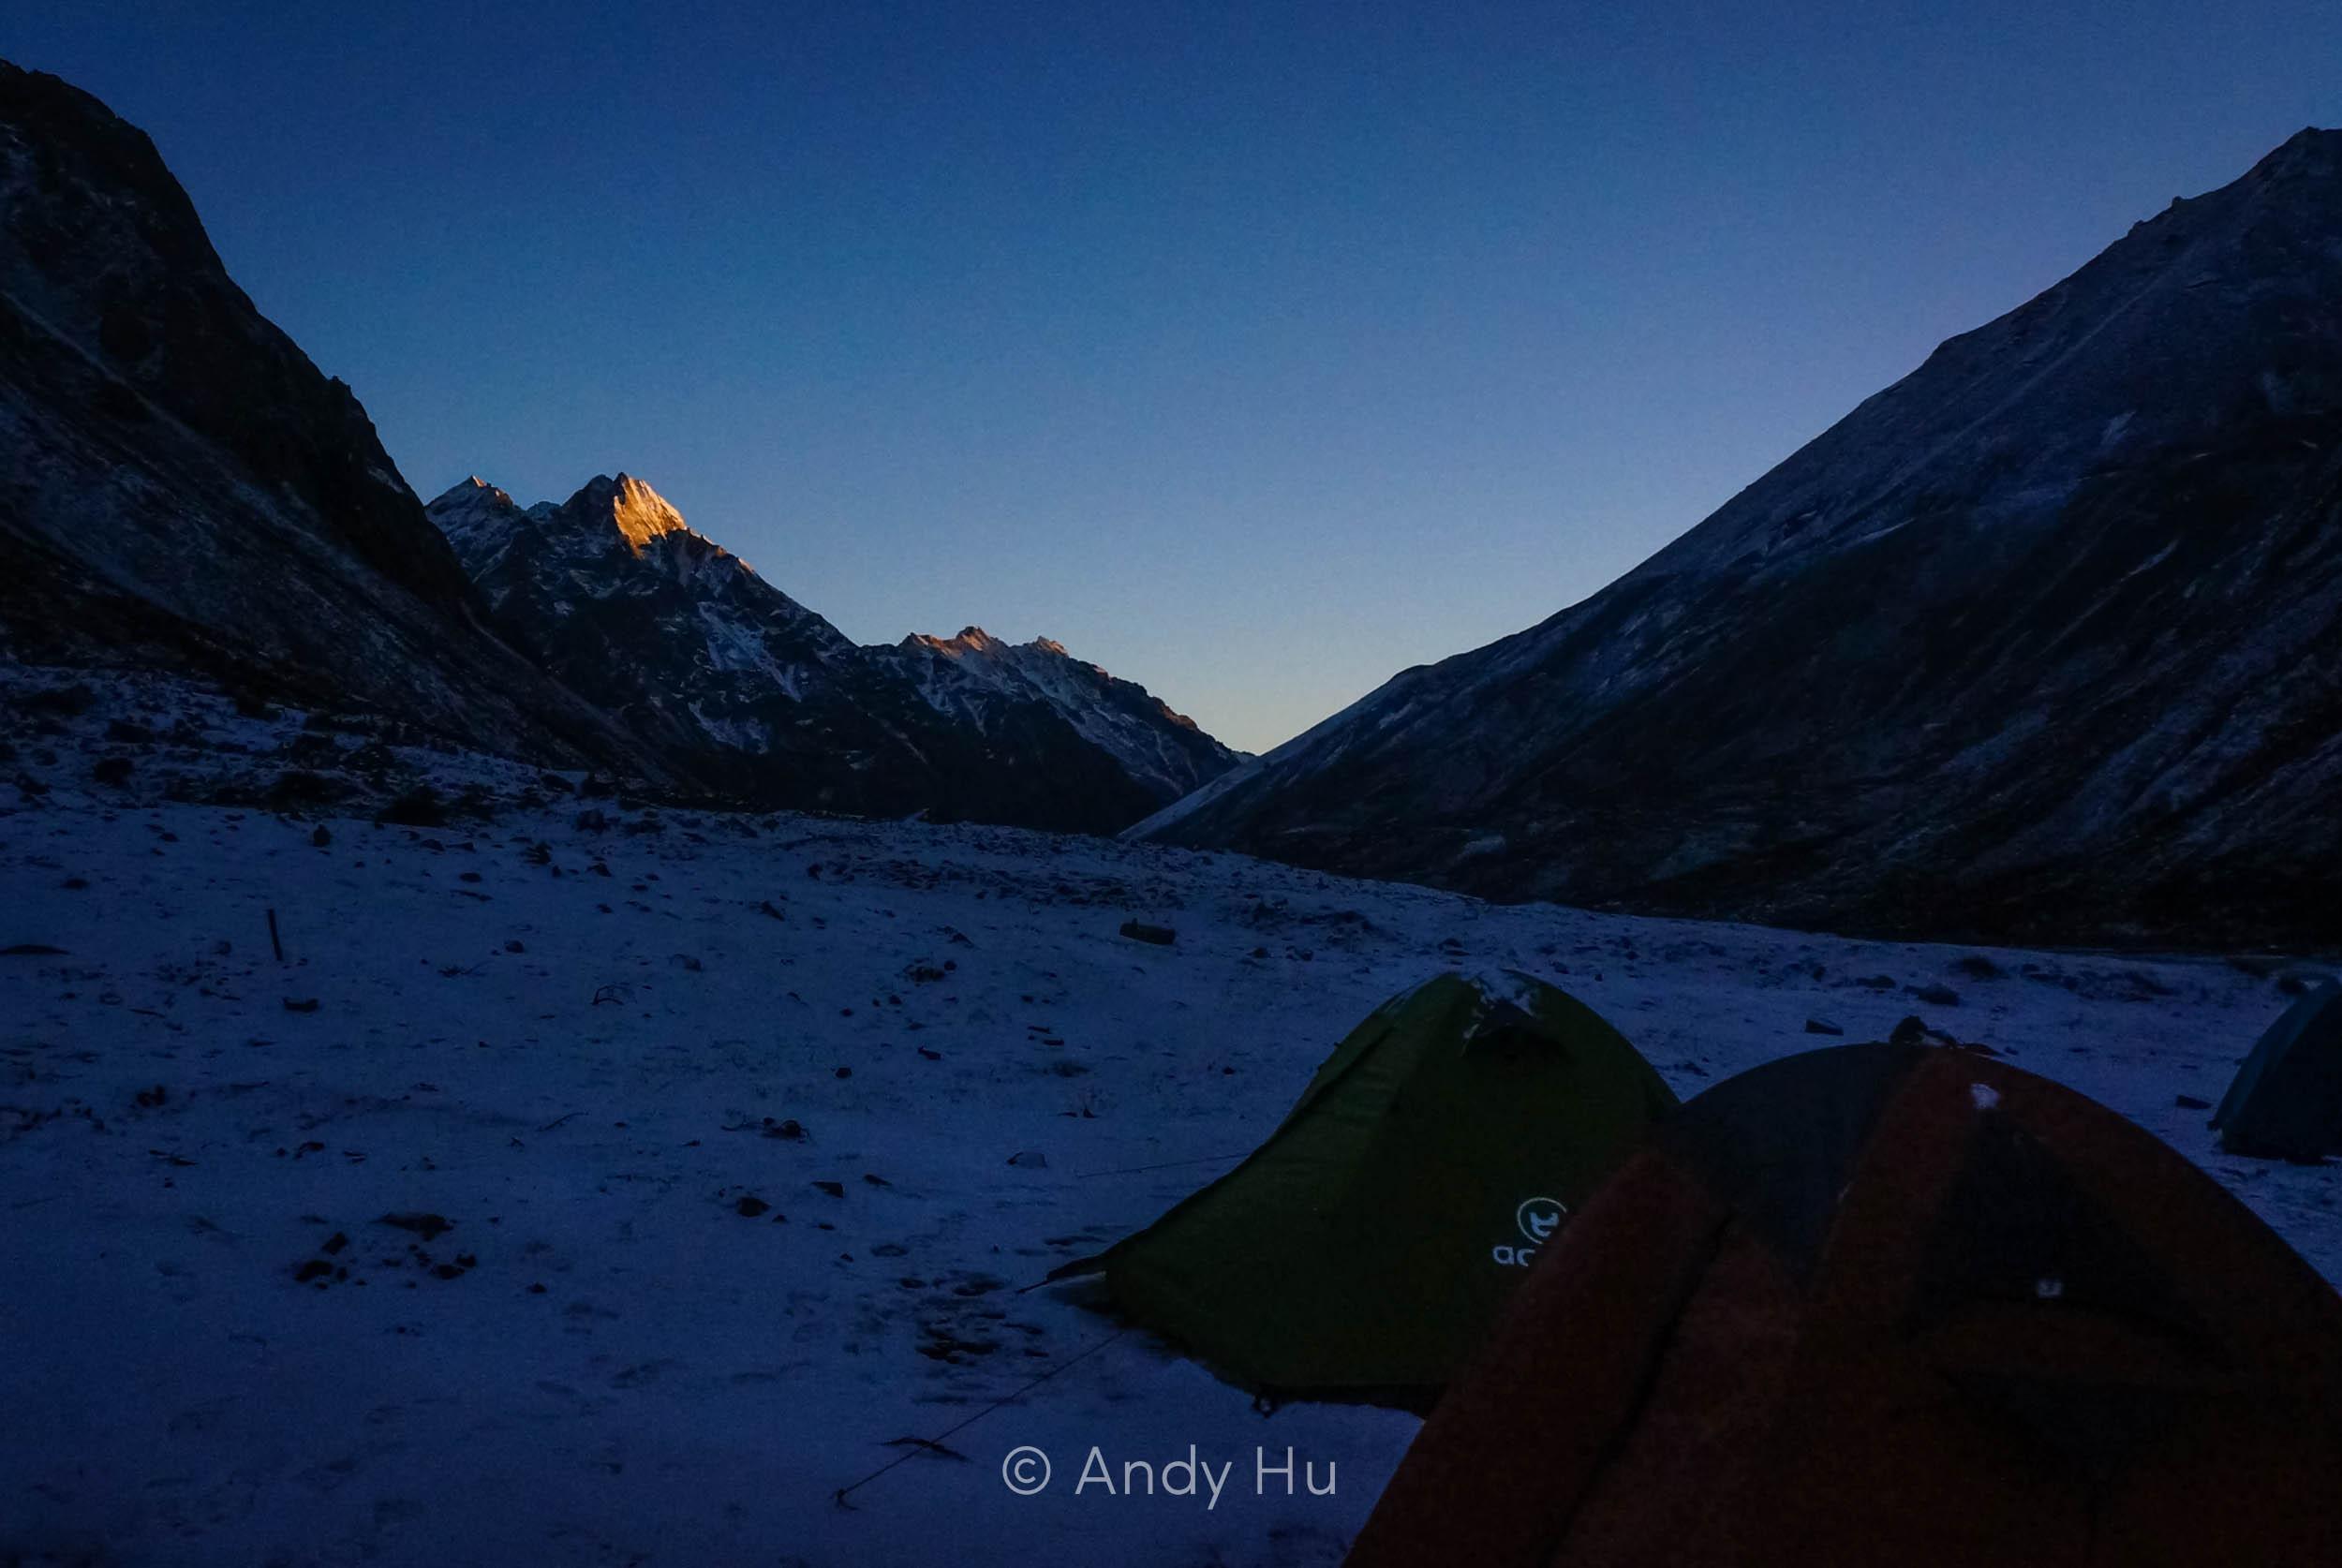 Sunset over Lower Riwoche campsite, day 1 Mt. Gongga Trek